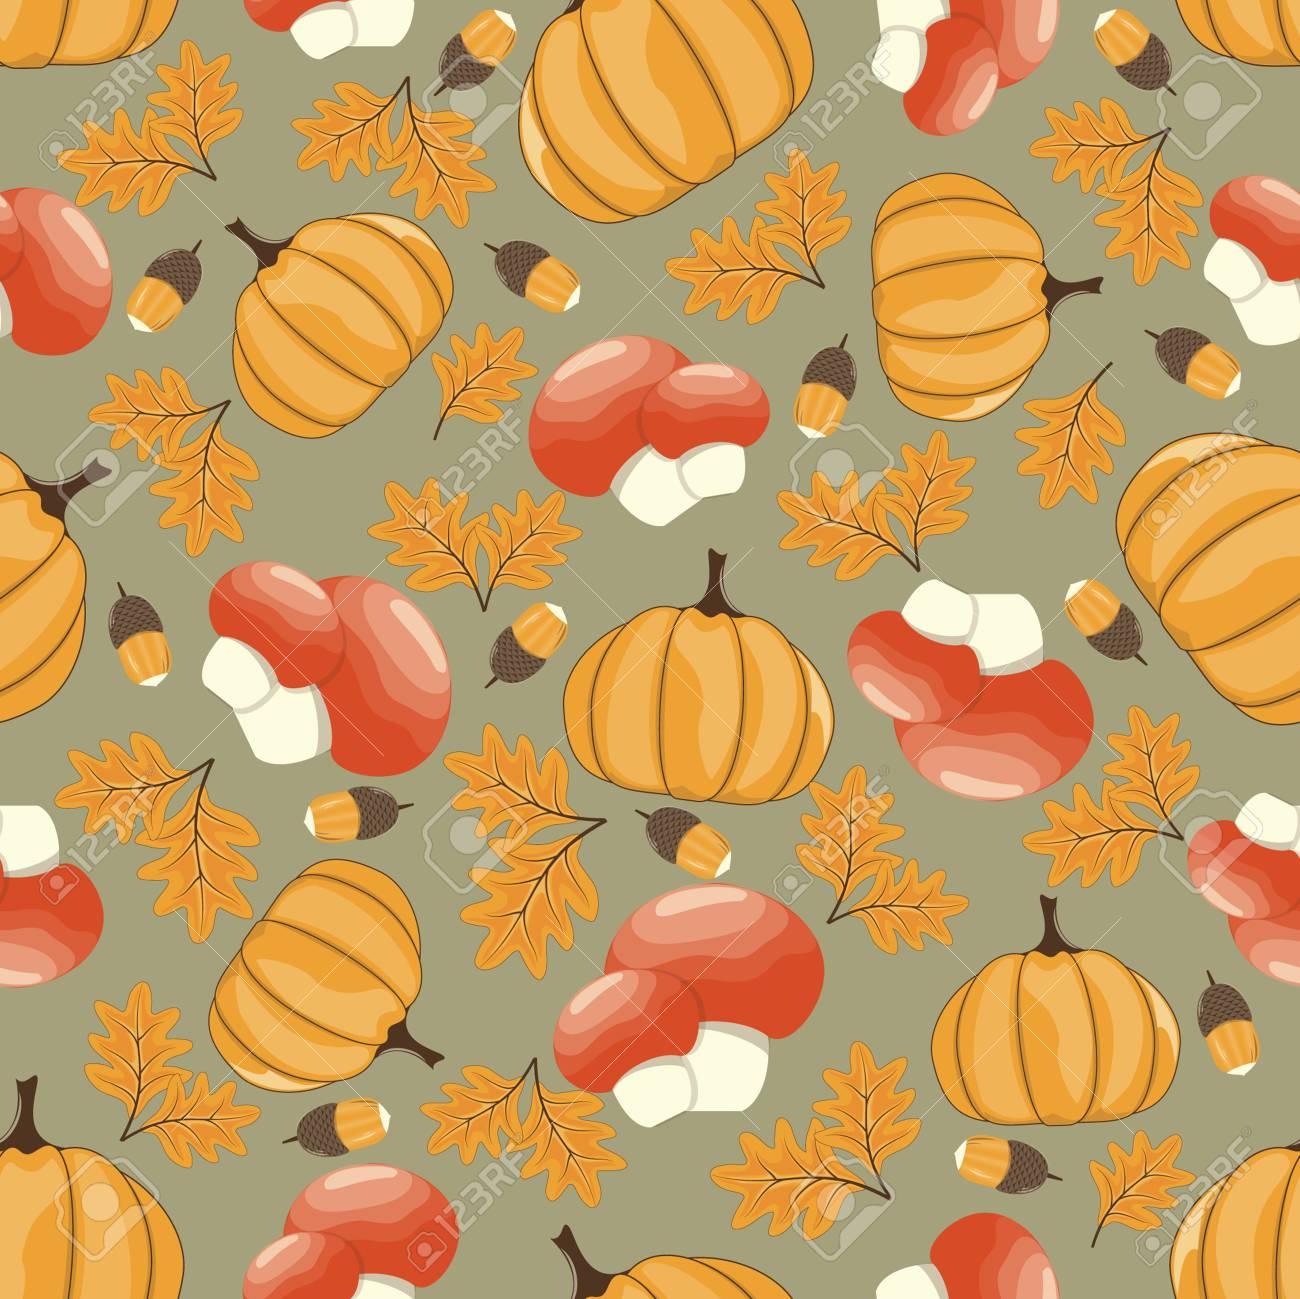 Autumn Seamless Pattern Scrapbook Design Elements Thanksgiving